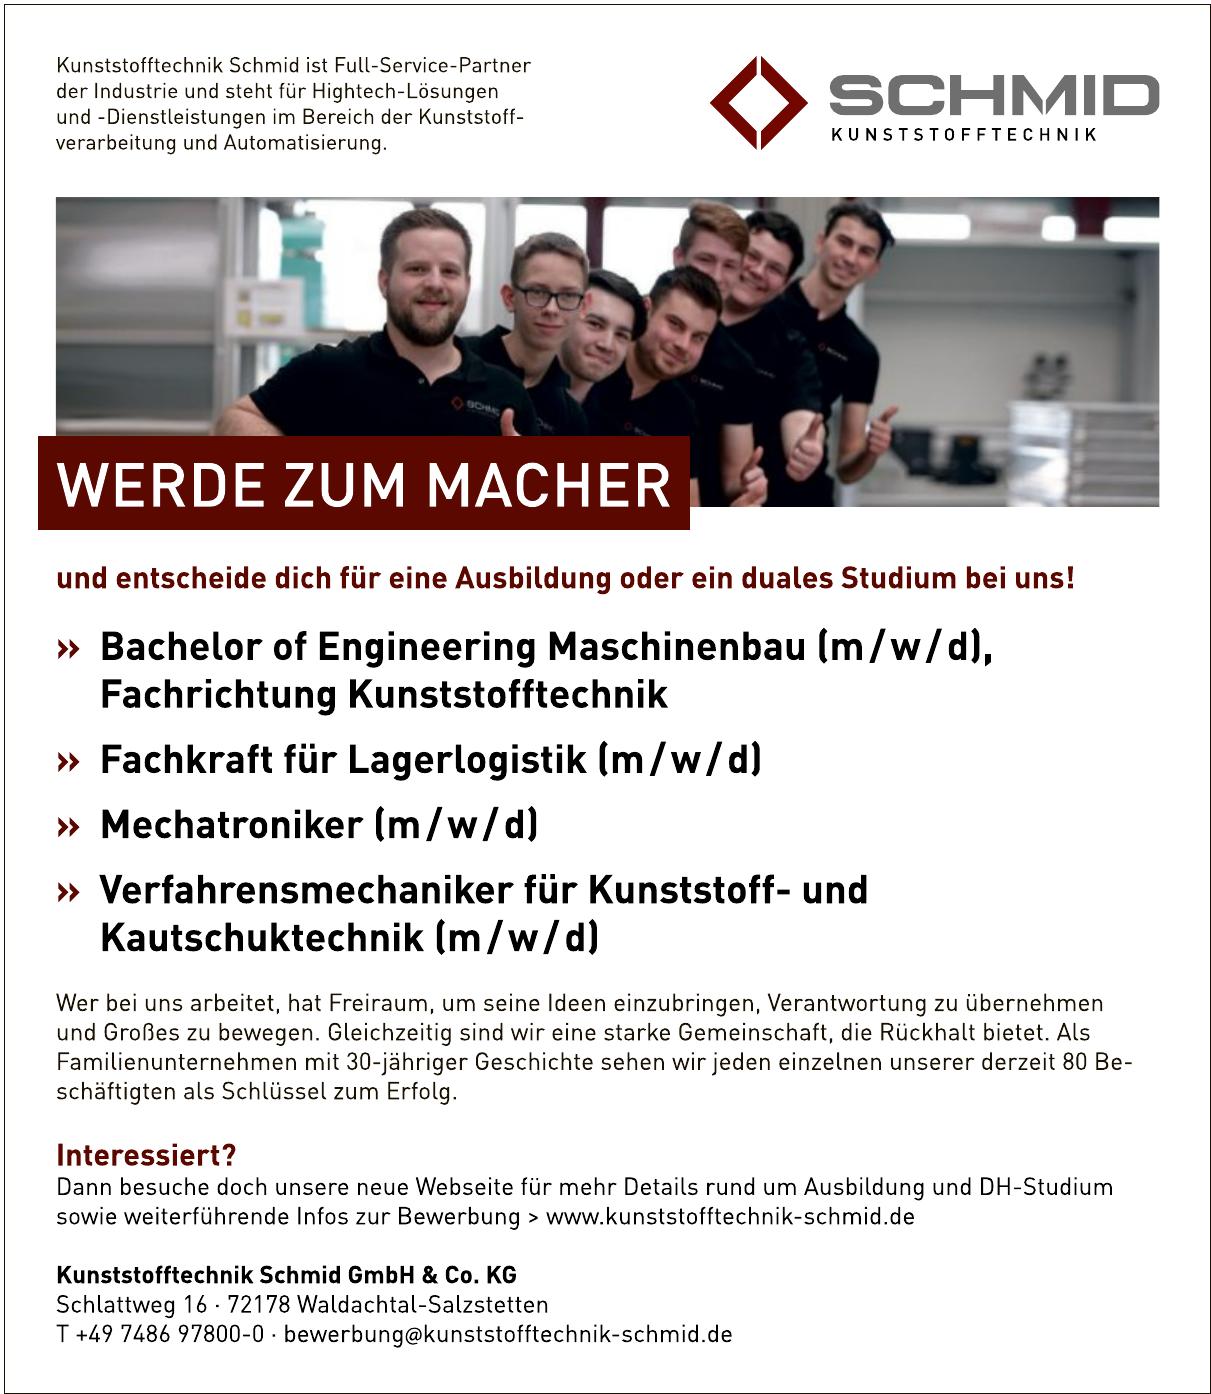 Kunststofftechnik Schmid GmbH & Co. KG